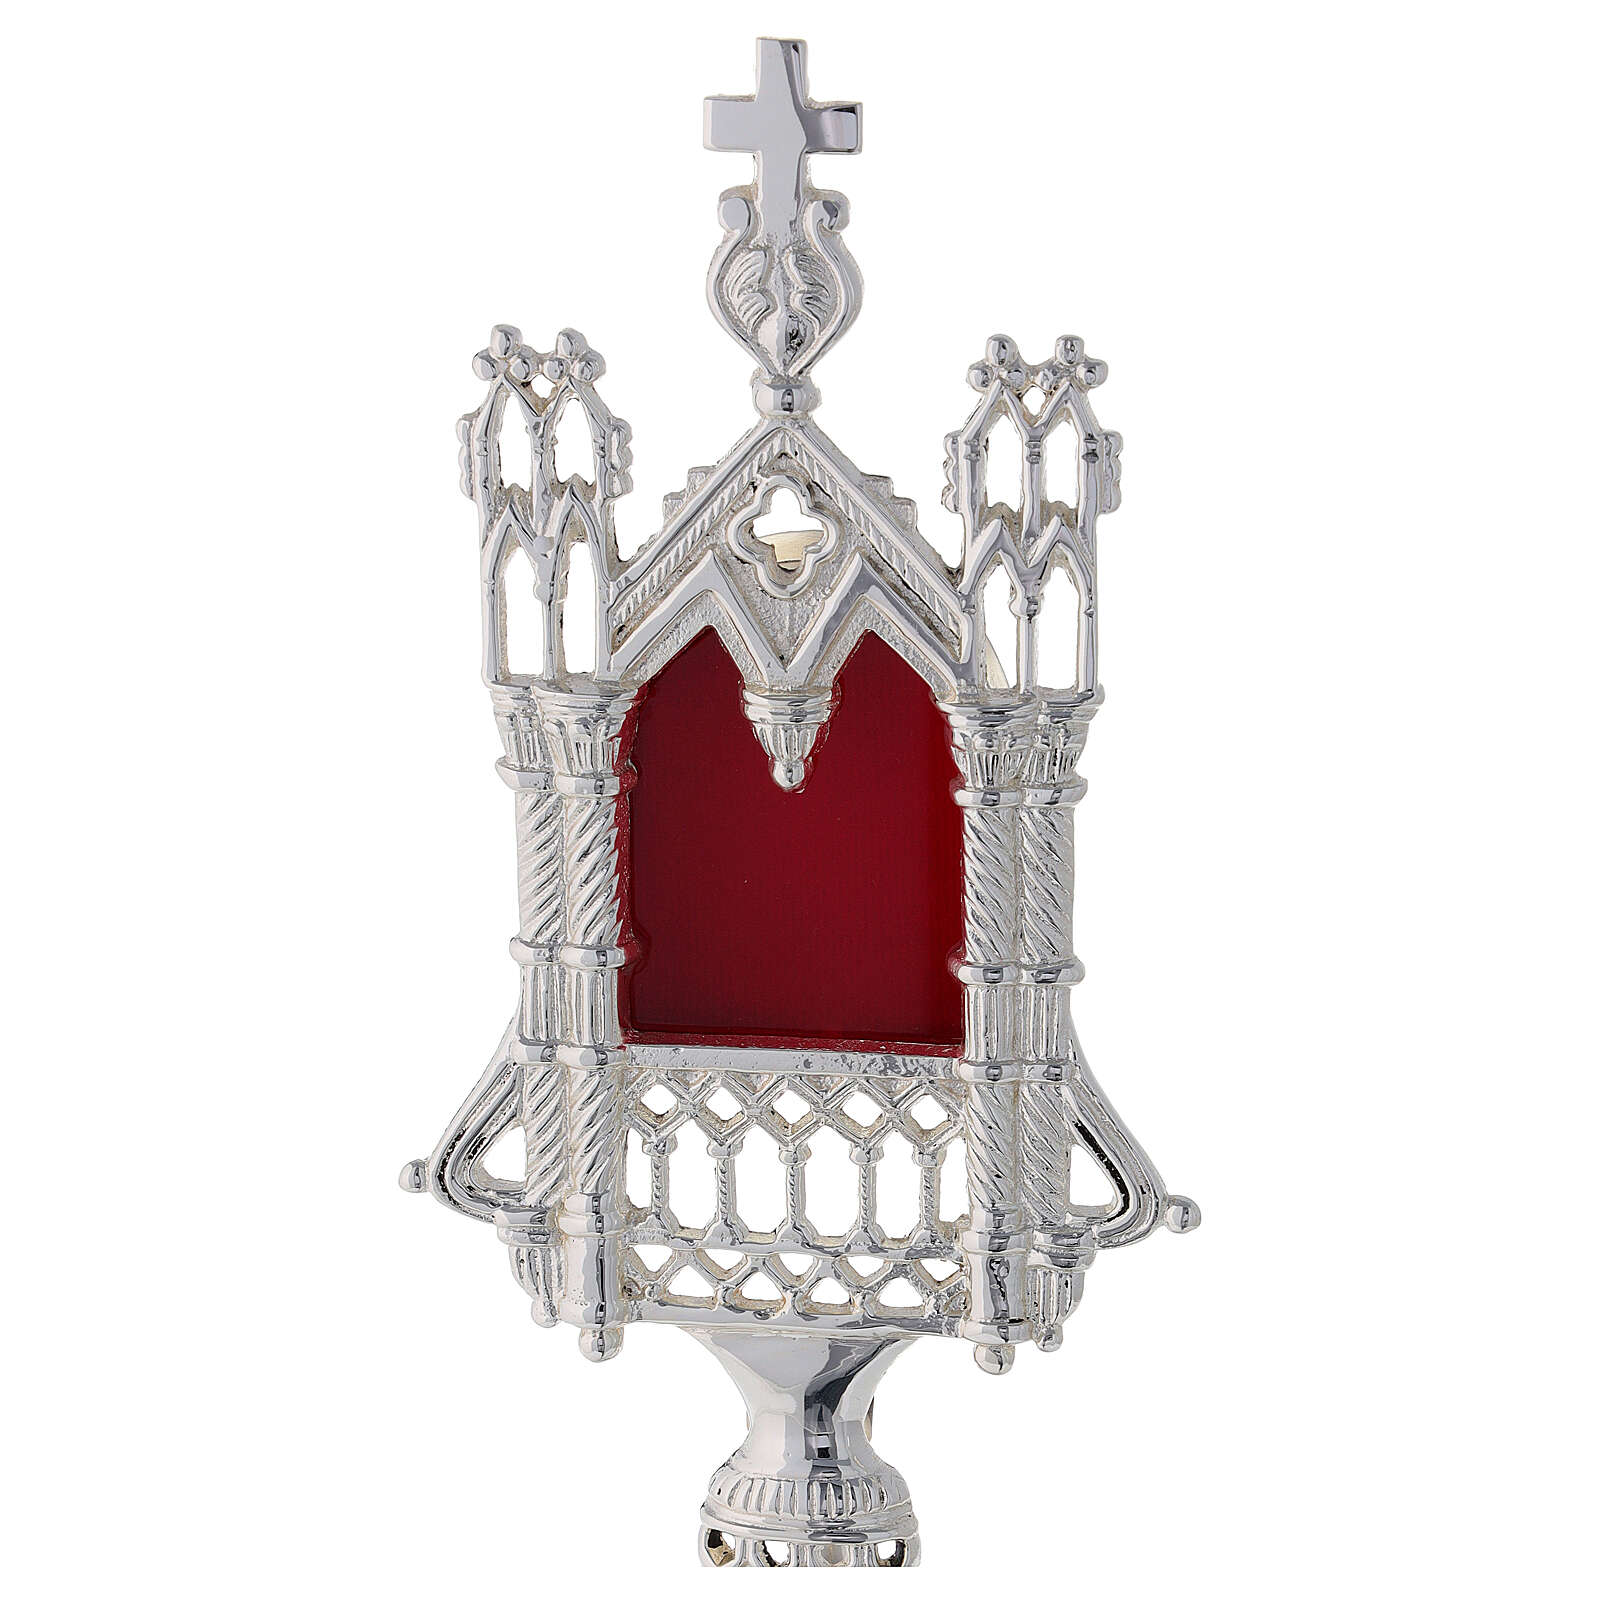 Reliquiario neogotico ottone argentato 28 cm 4